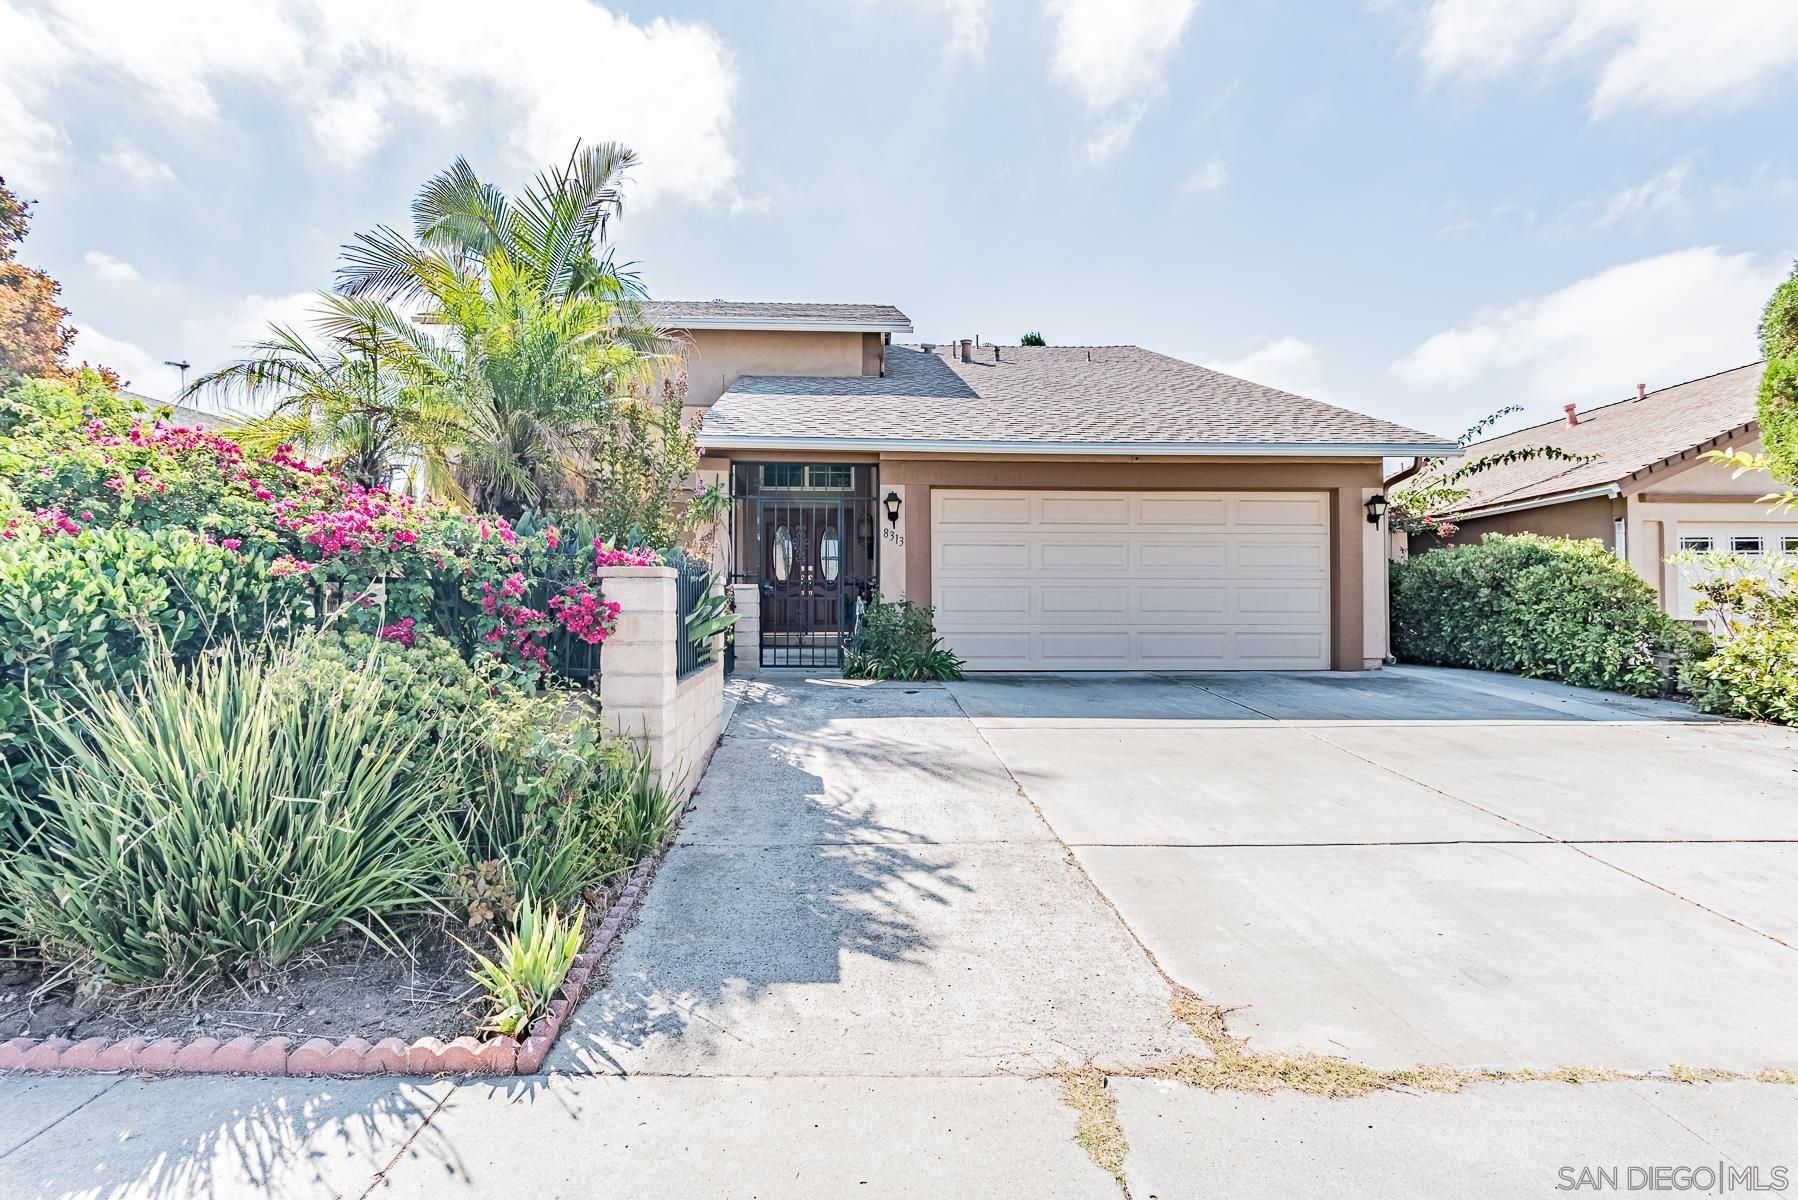 8313 Santa Arminta Ave, San Diego, CA 92126 - MLS#: 210026642